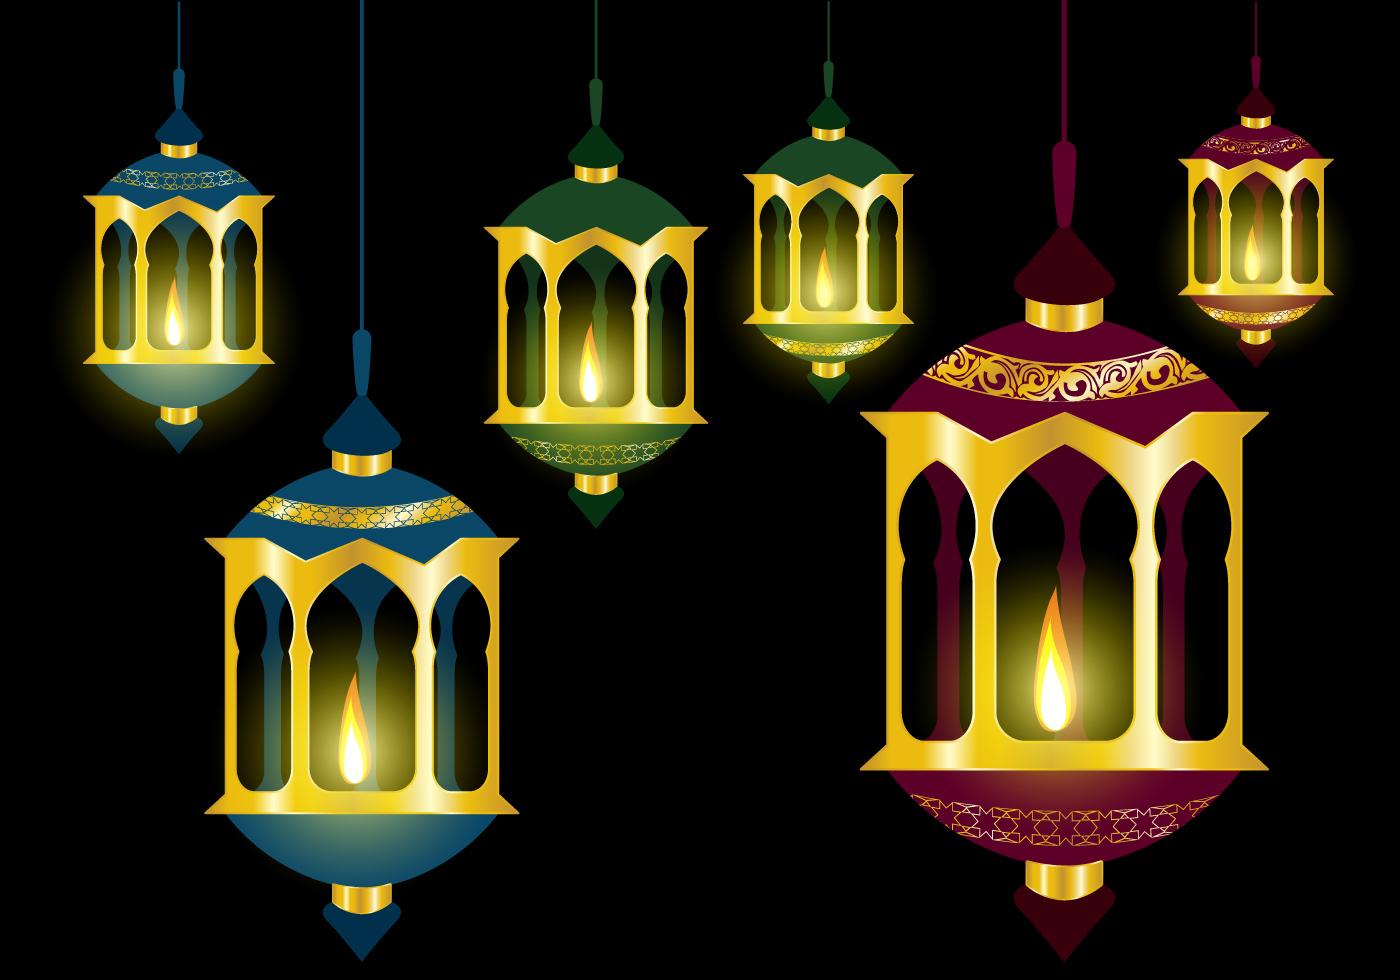 Oil Lamp Pelita Vectors - Download Free Vector Art, Stock Graphics ...